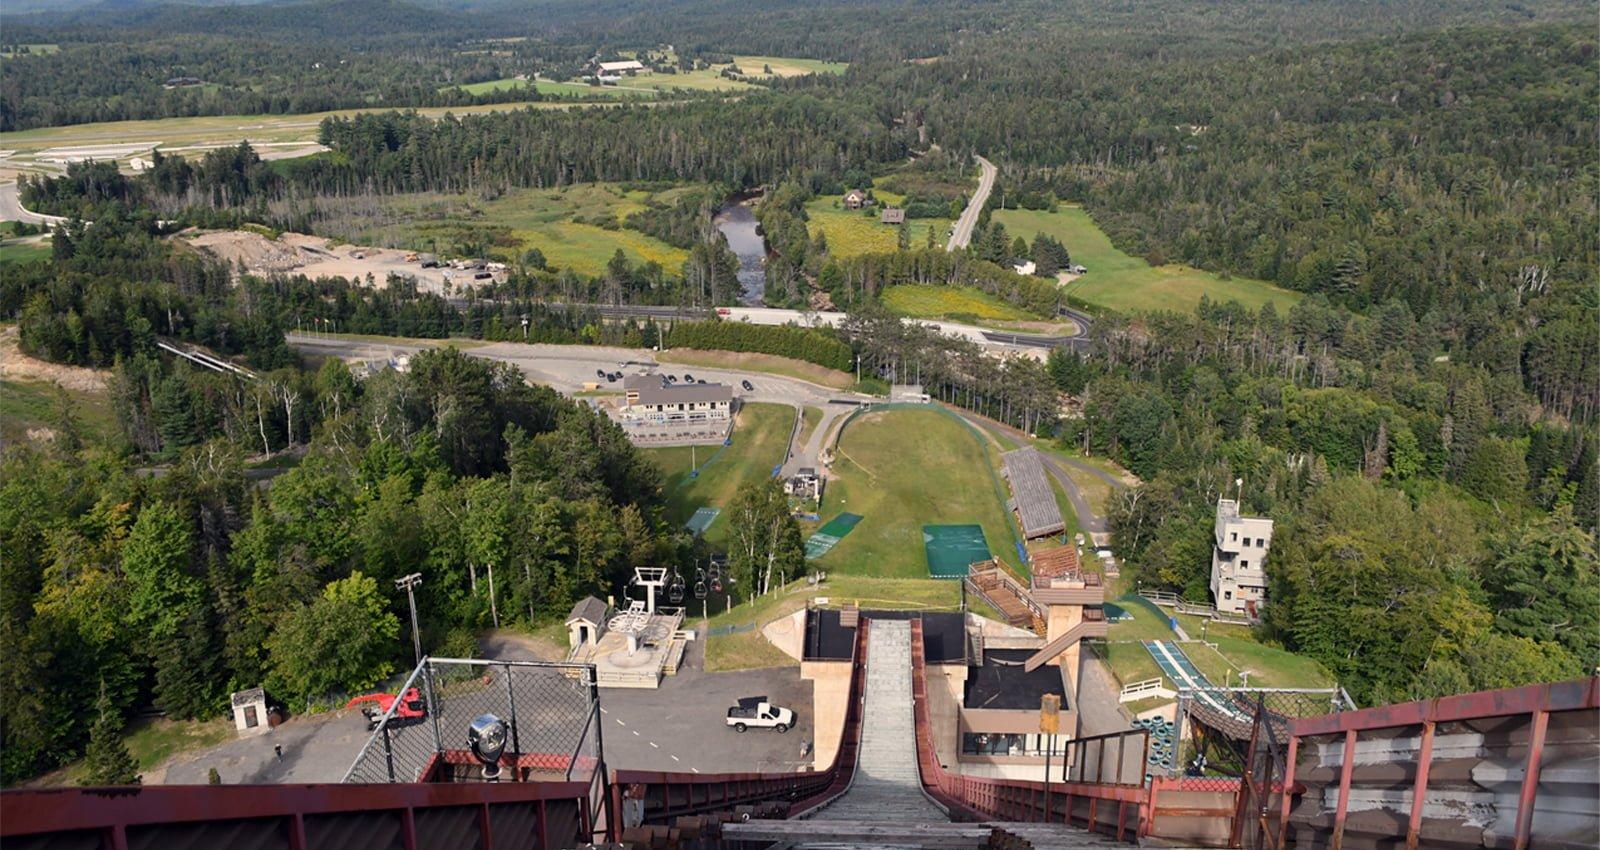 Lake Placid Olympic Ski Jumps |Stand atop the Olympic ski jumps at Lake Placid and dare to look down. | Photo Courtesy of Lisa Ballard